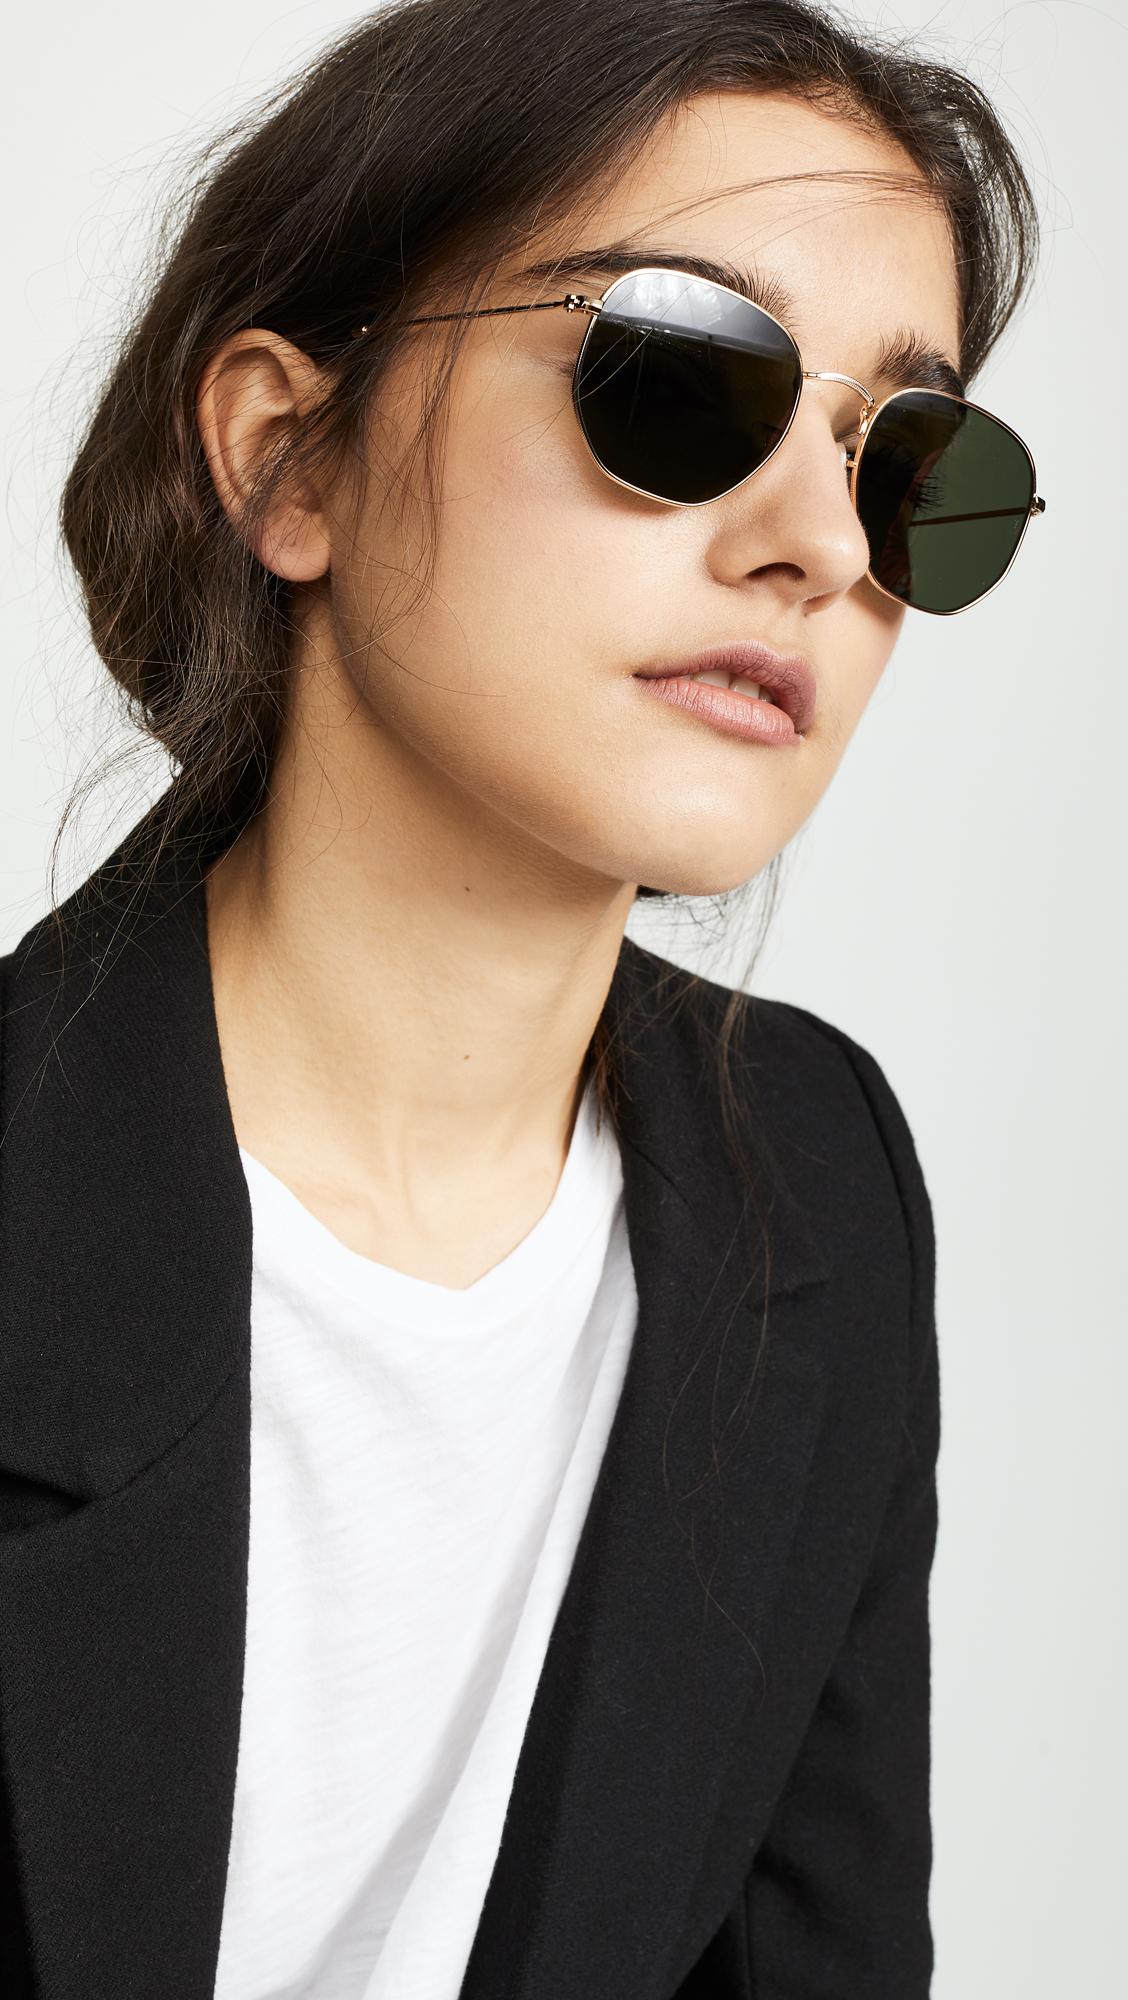 f2056402fbf0 Ray-Ban RB3548N Hexagonal Sunglasses